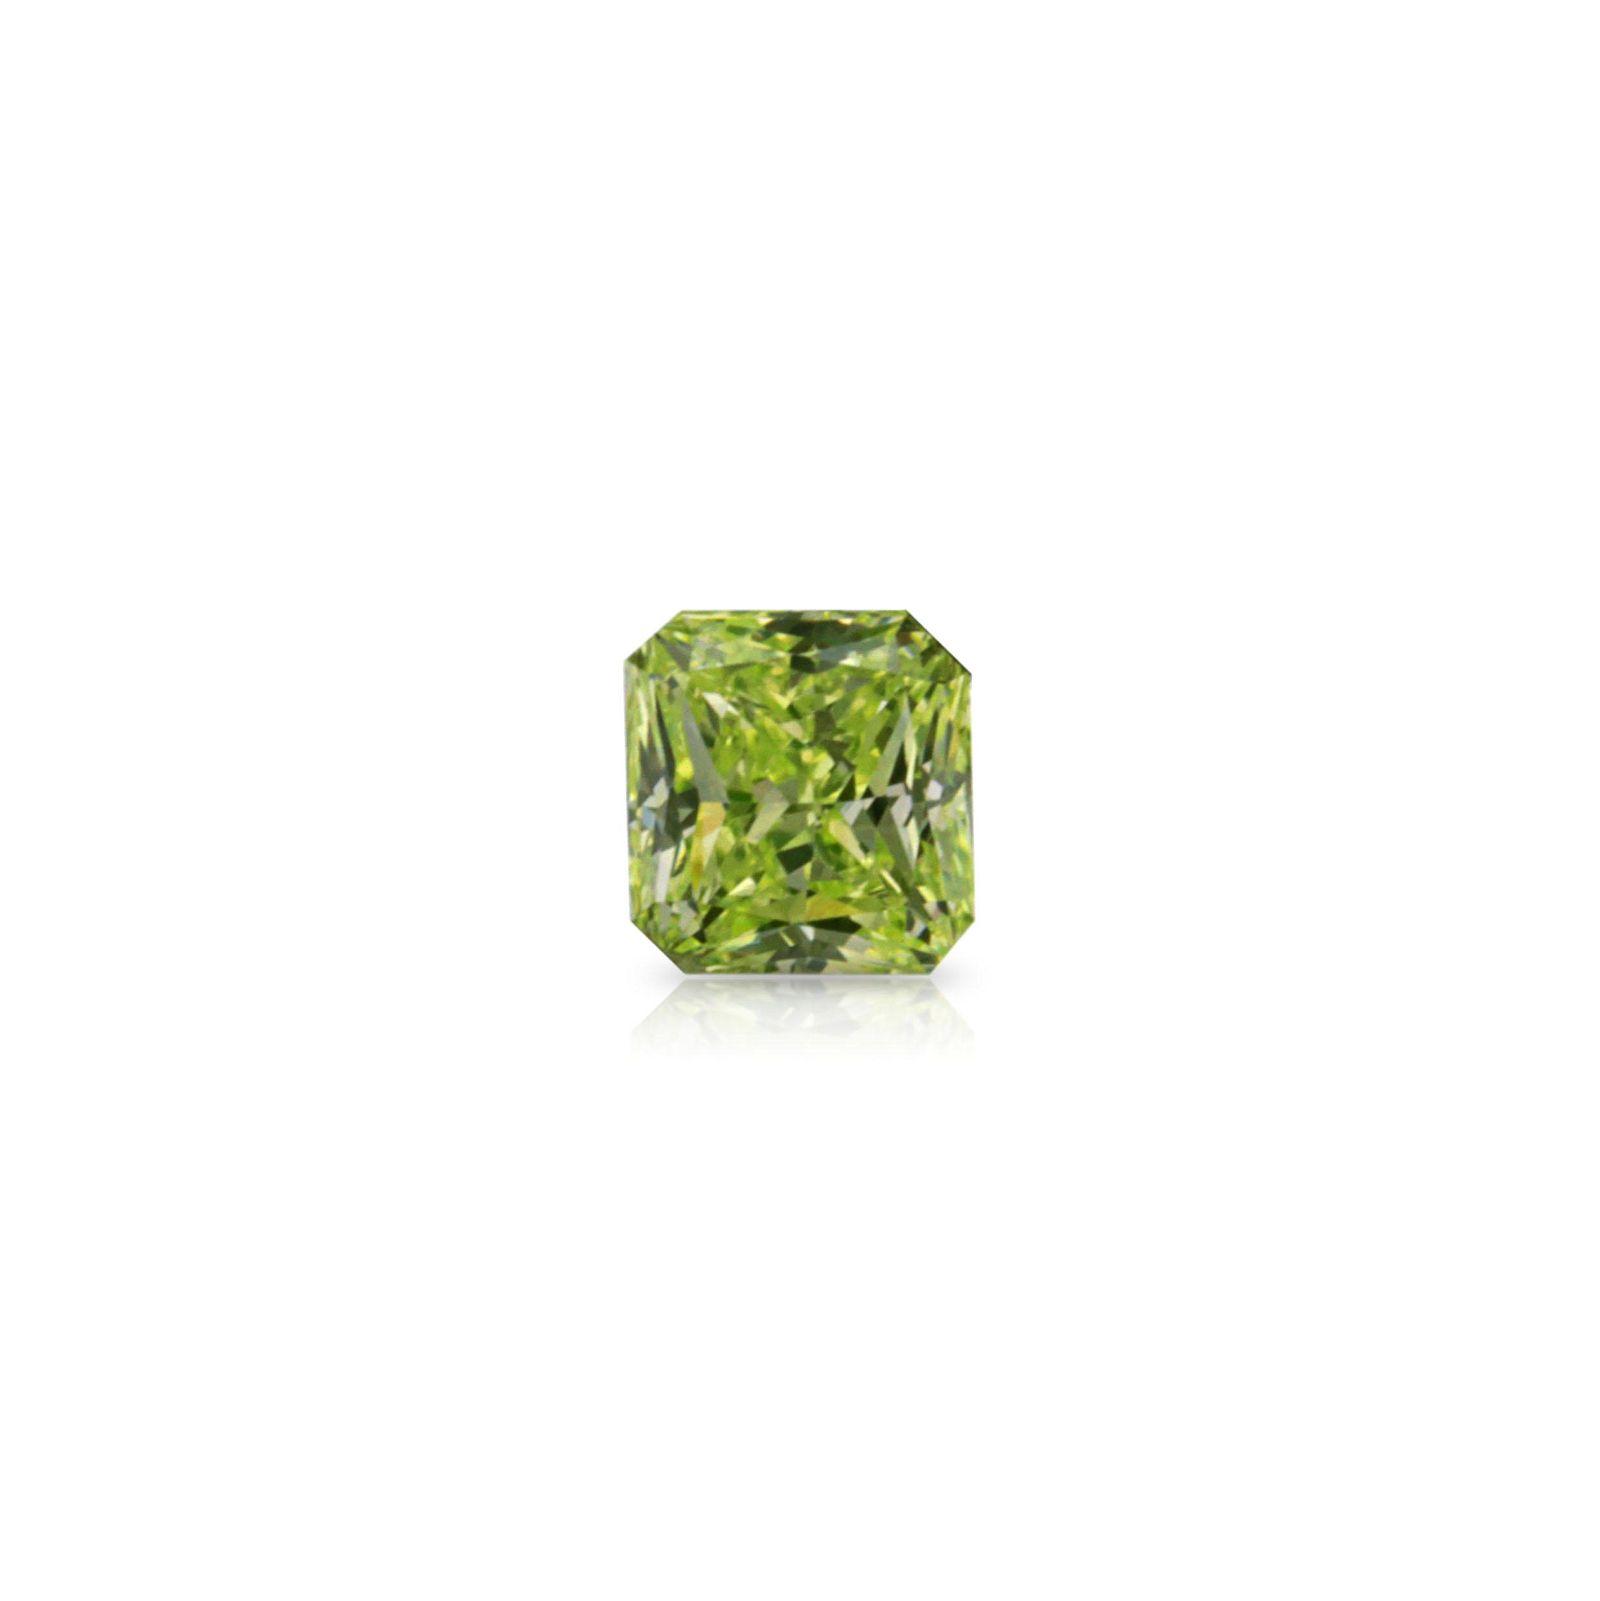 Neon Green Diamond, Natural Fancy Intense Green Yellow